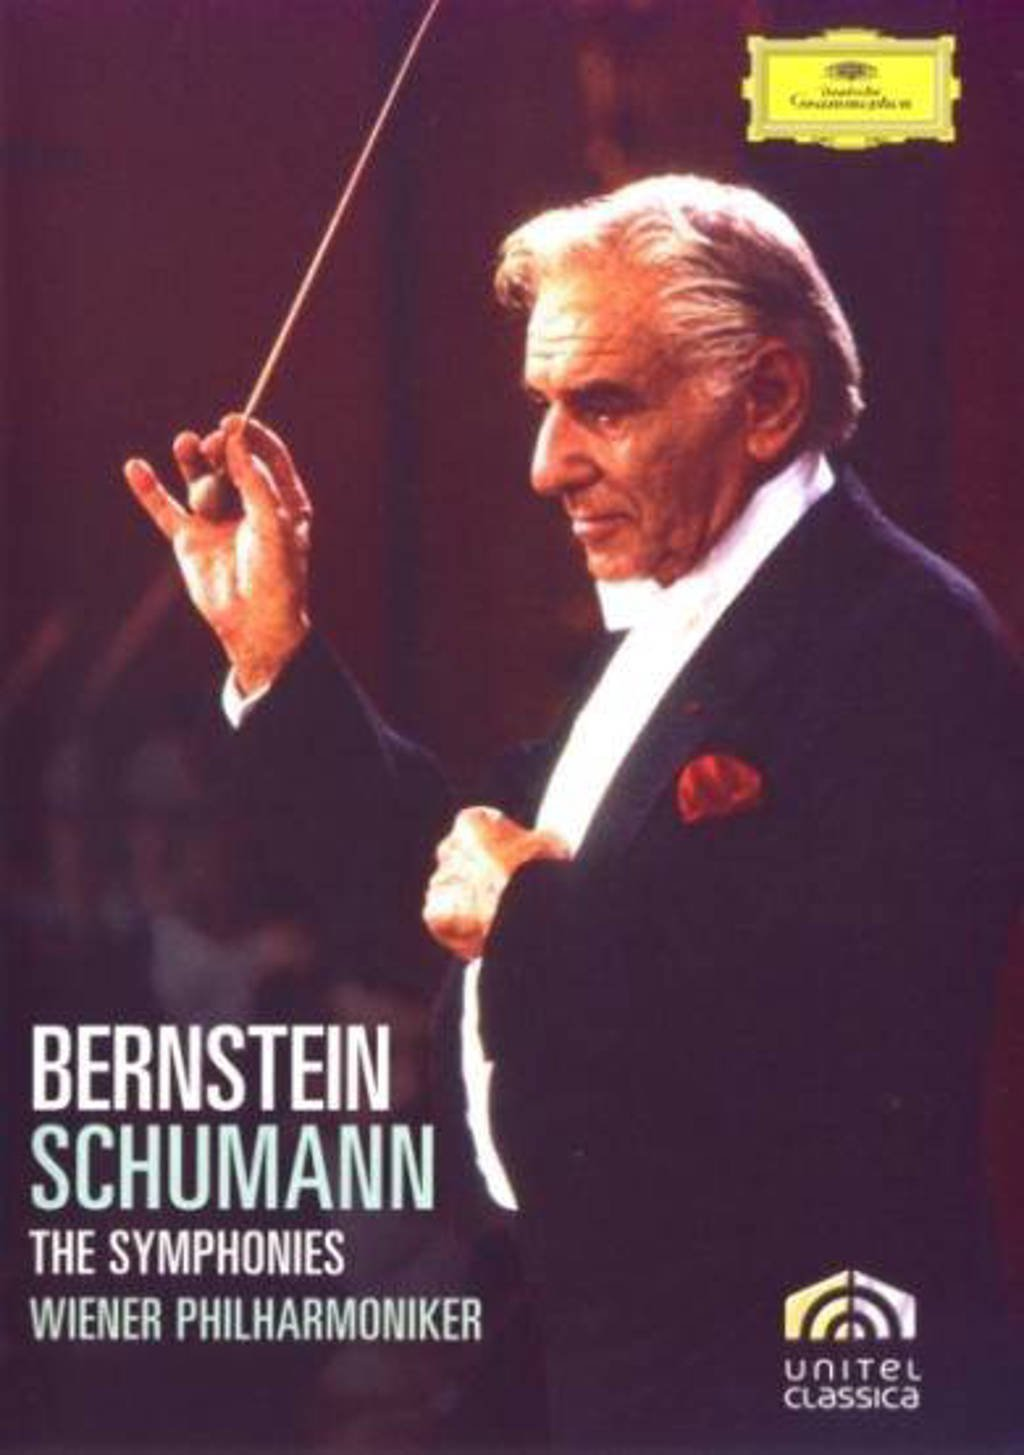 Leonard Bernstein - The Symphonies (DVD)